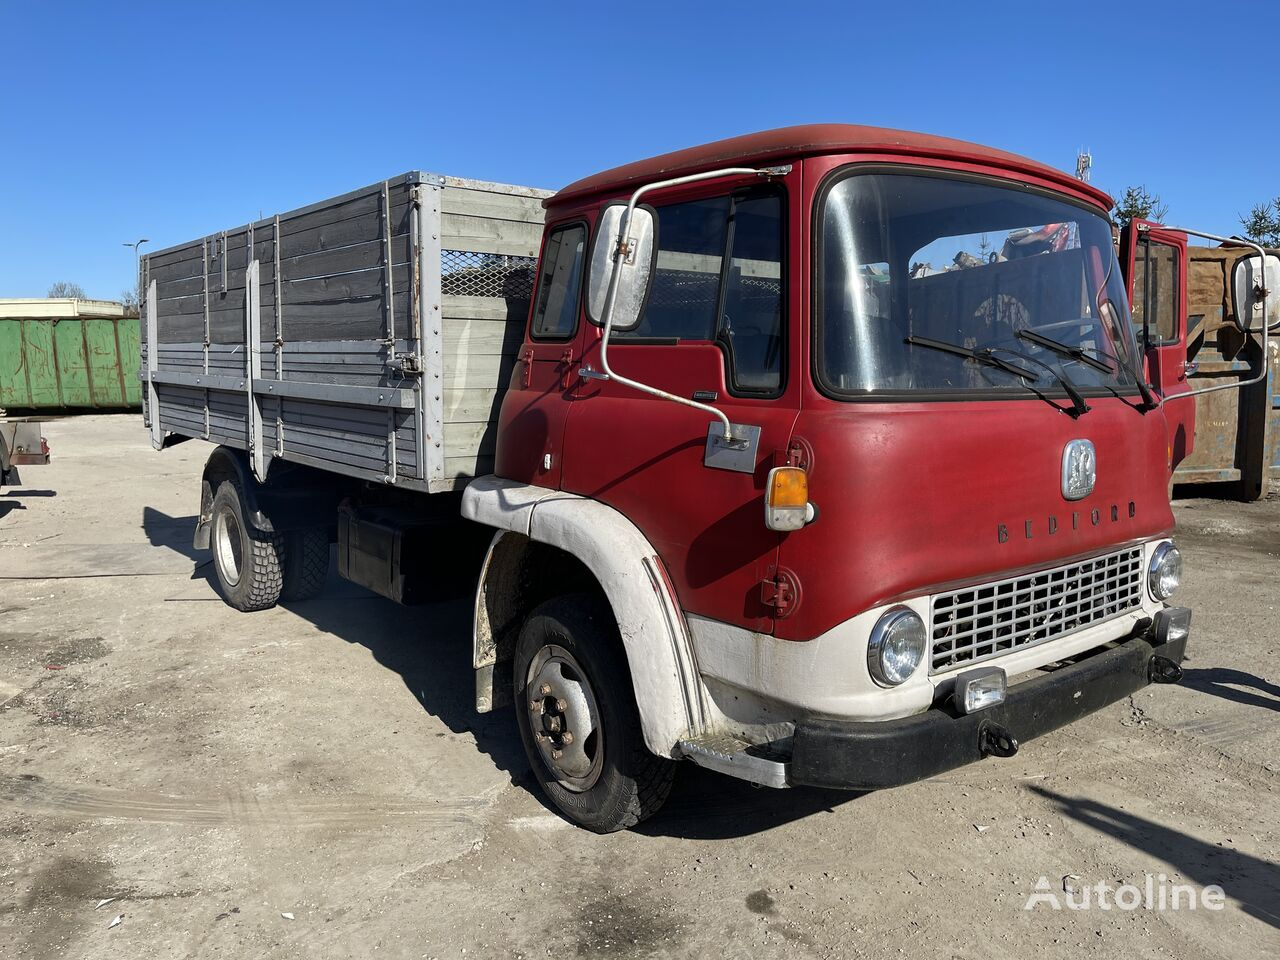 BEDFORD dump truck